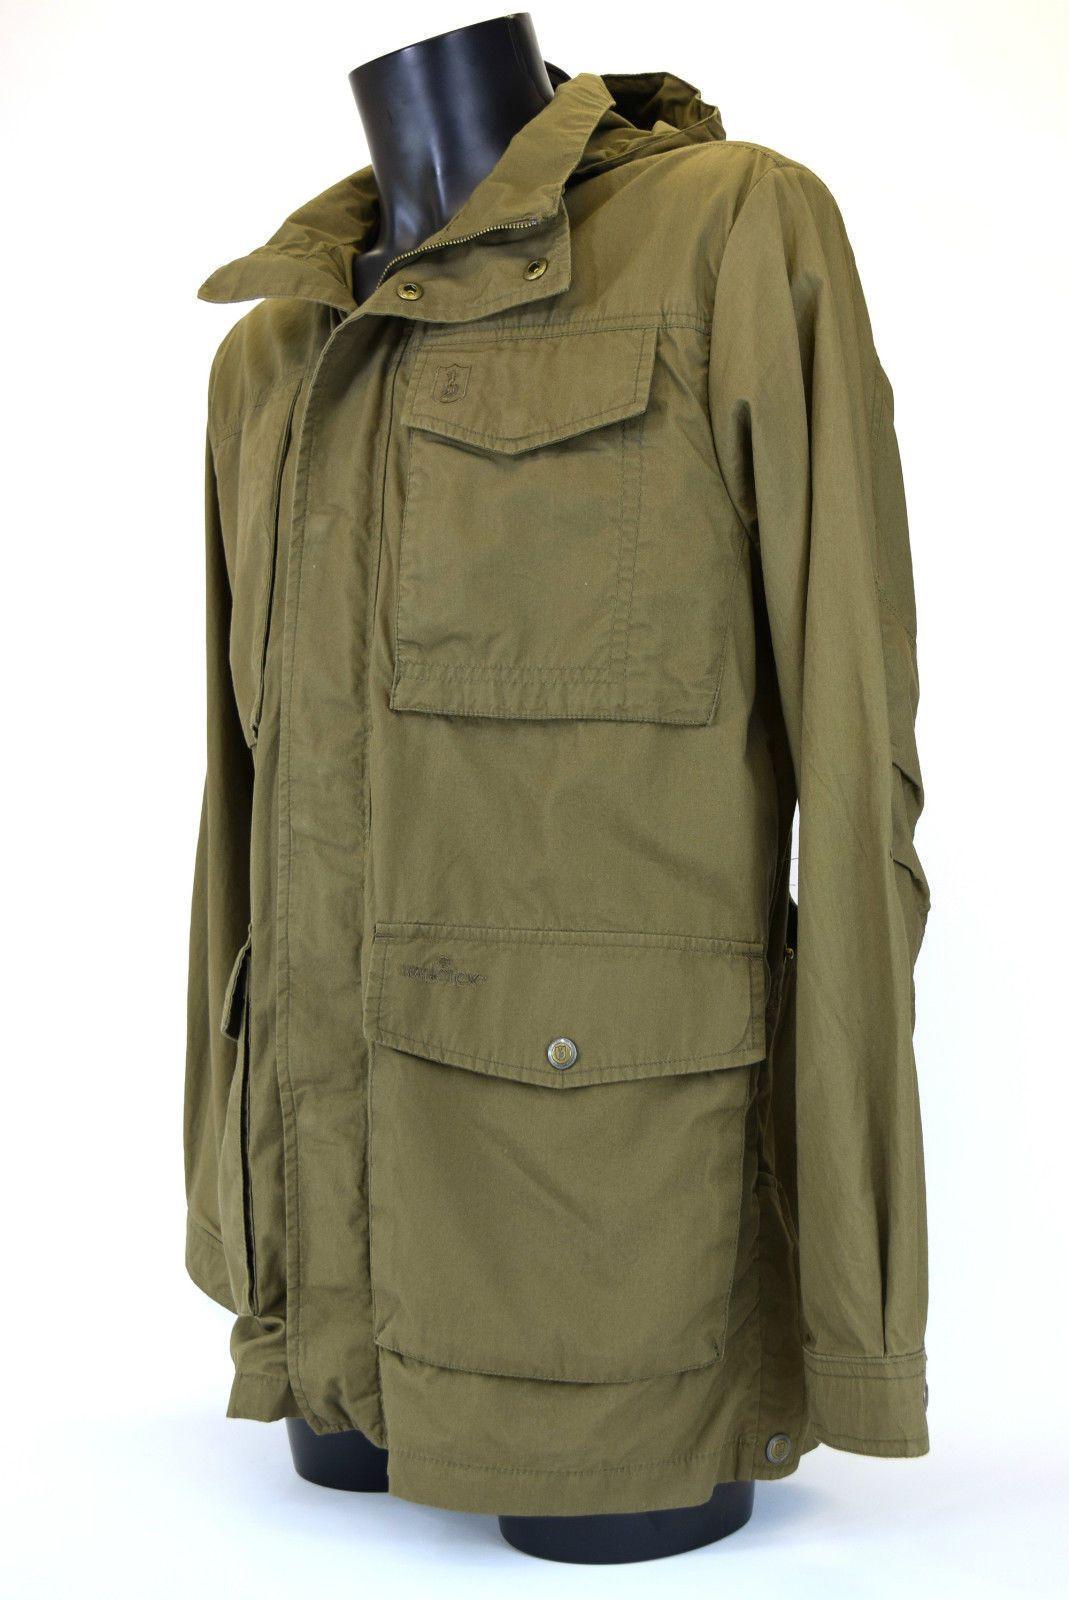 e59a017f08194 sale-lightweight-deerhunter-safari-moss-olive-green-shooting-jacket-hunting- coat-1269-p.jpg